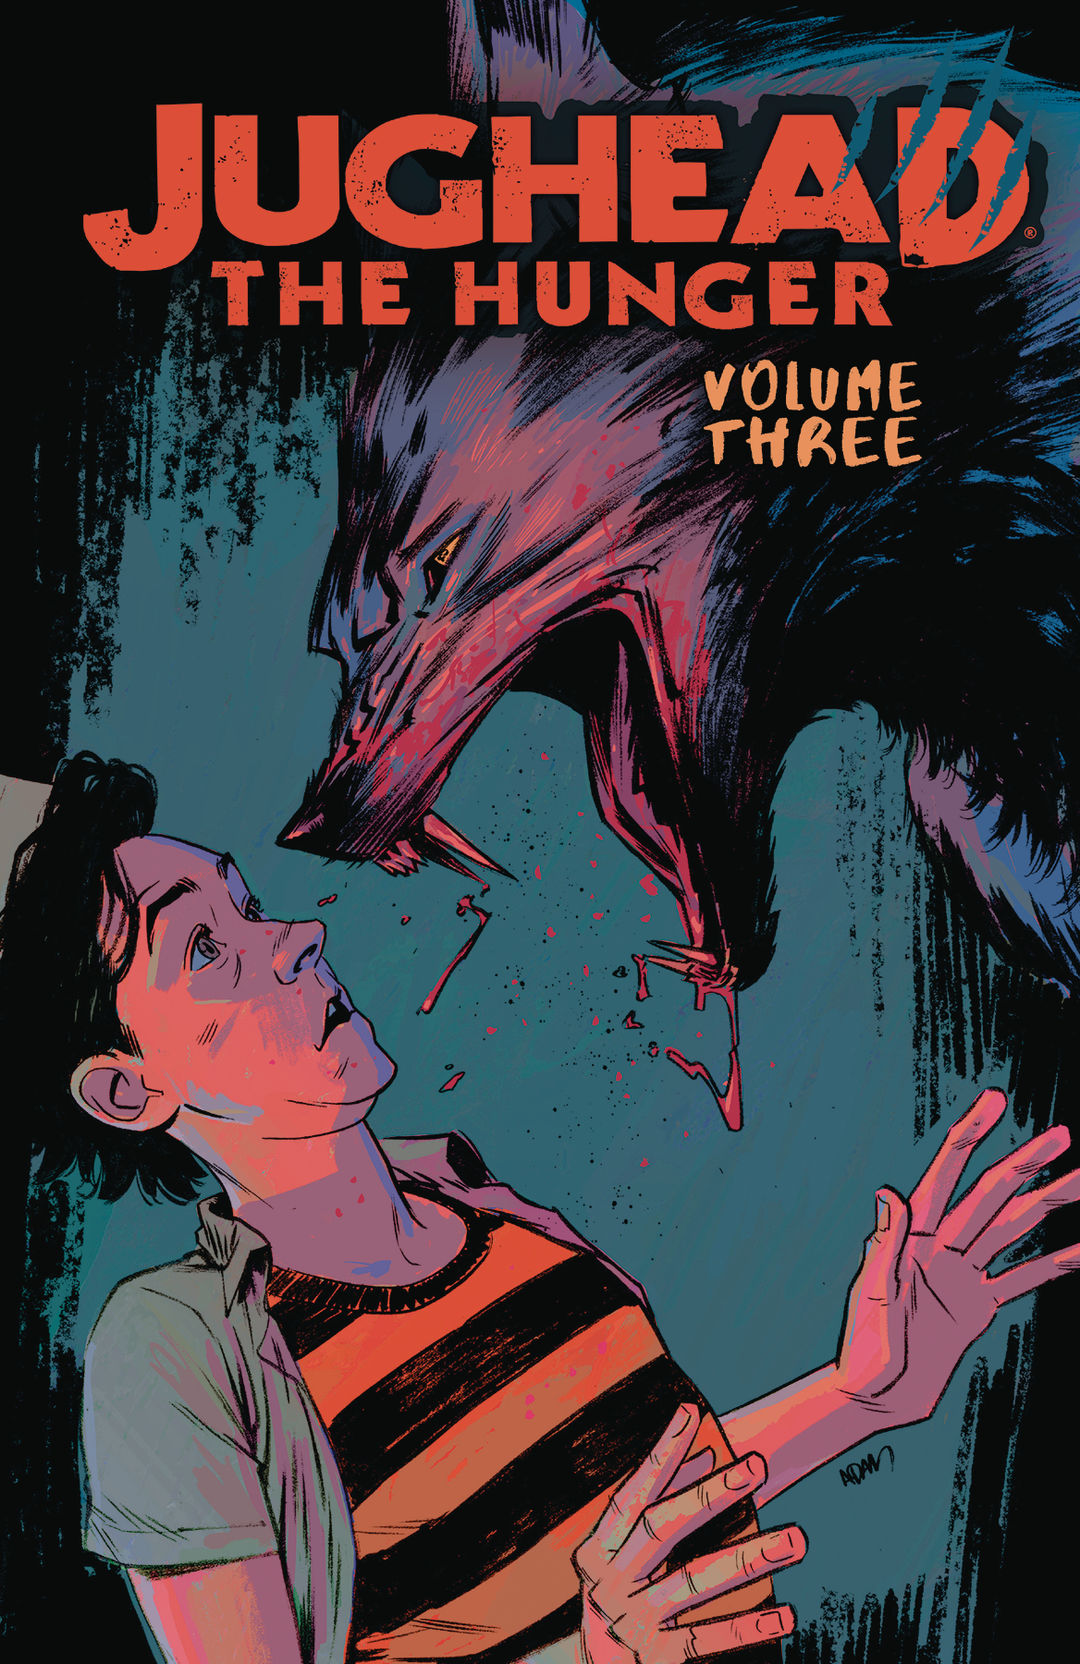 Archie Comics Juhead The Hunger volume 3 cover by Adam Gorham.